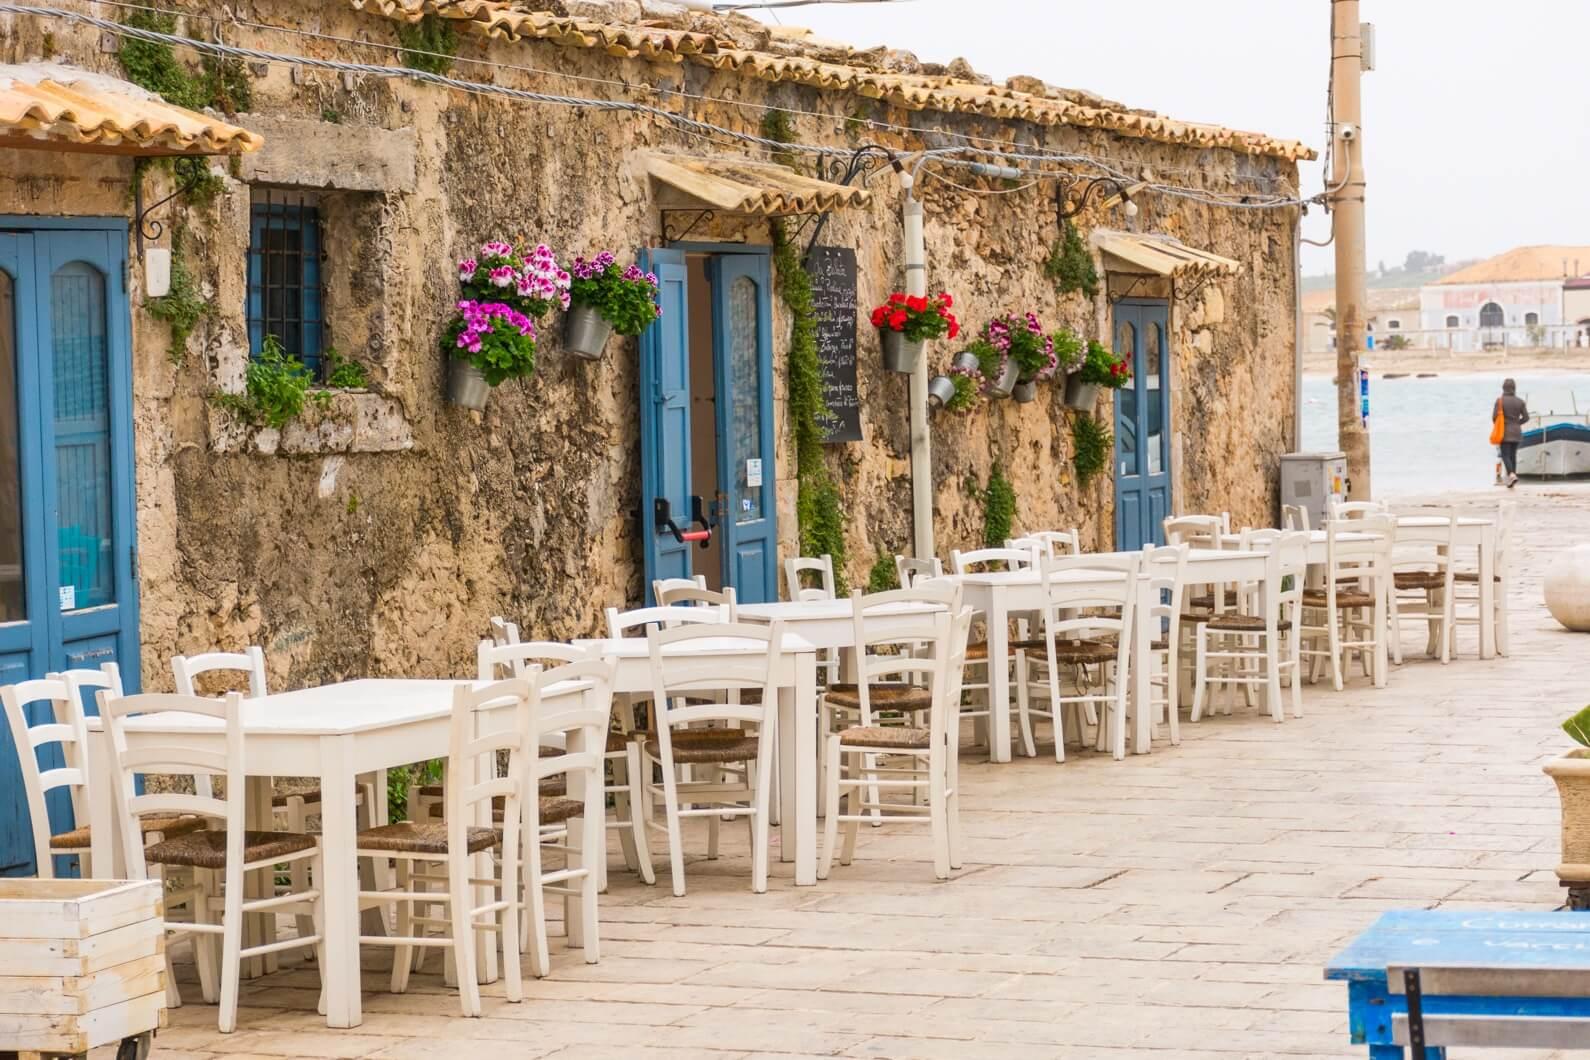 Location rustica per matrimonio in Sicilia